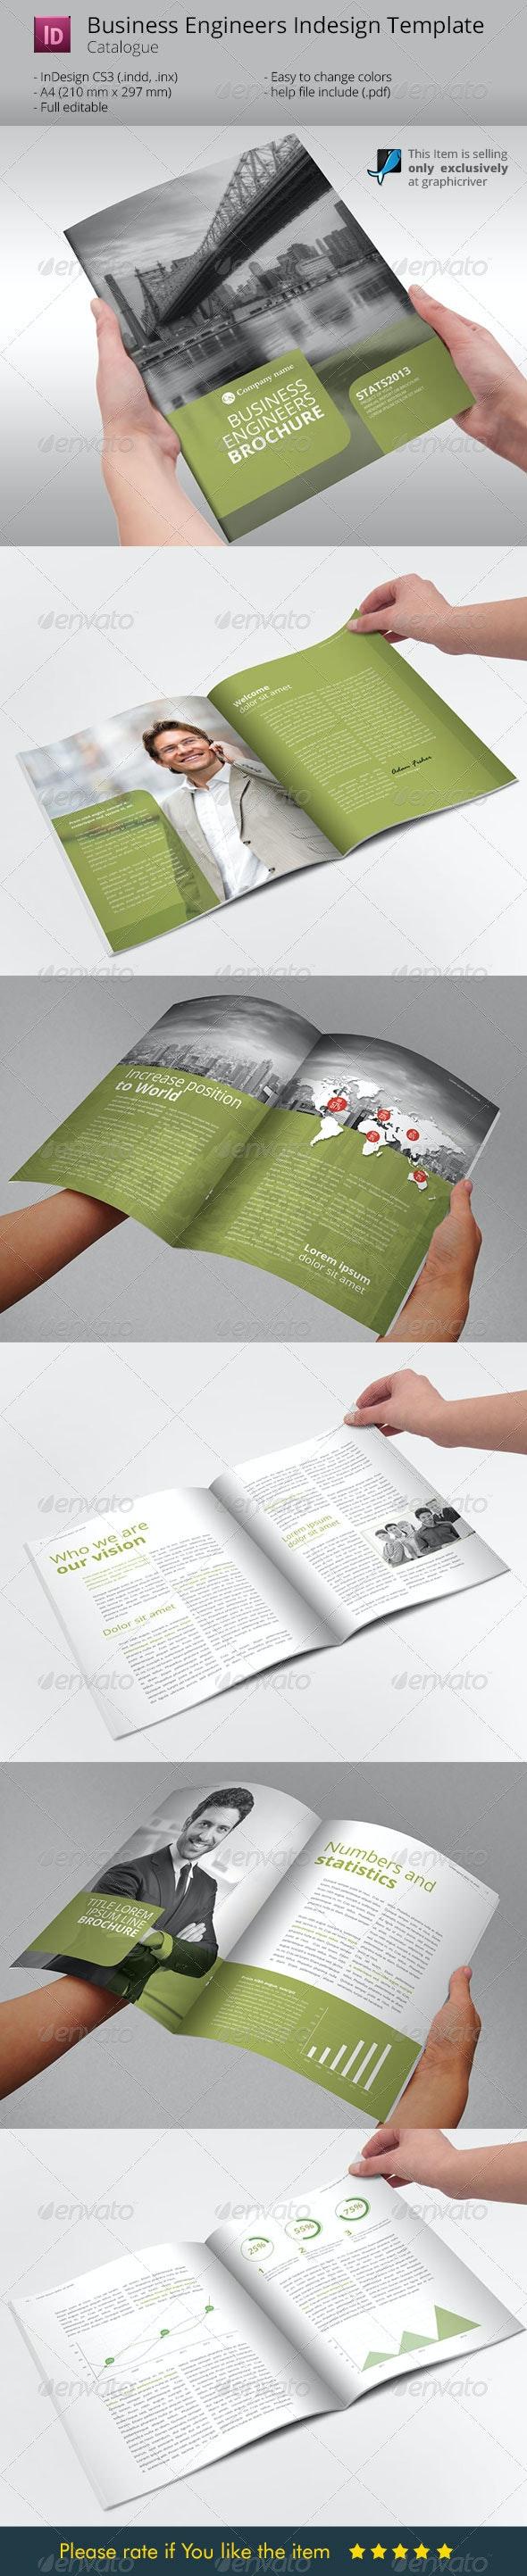 Business Engineers Green Indesign Template - Corporate Brochures